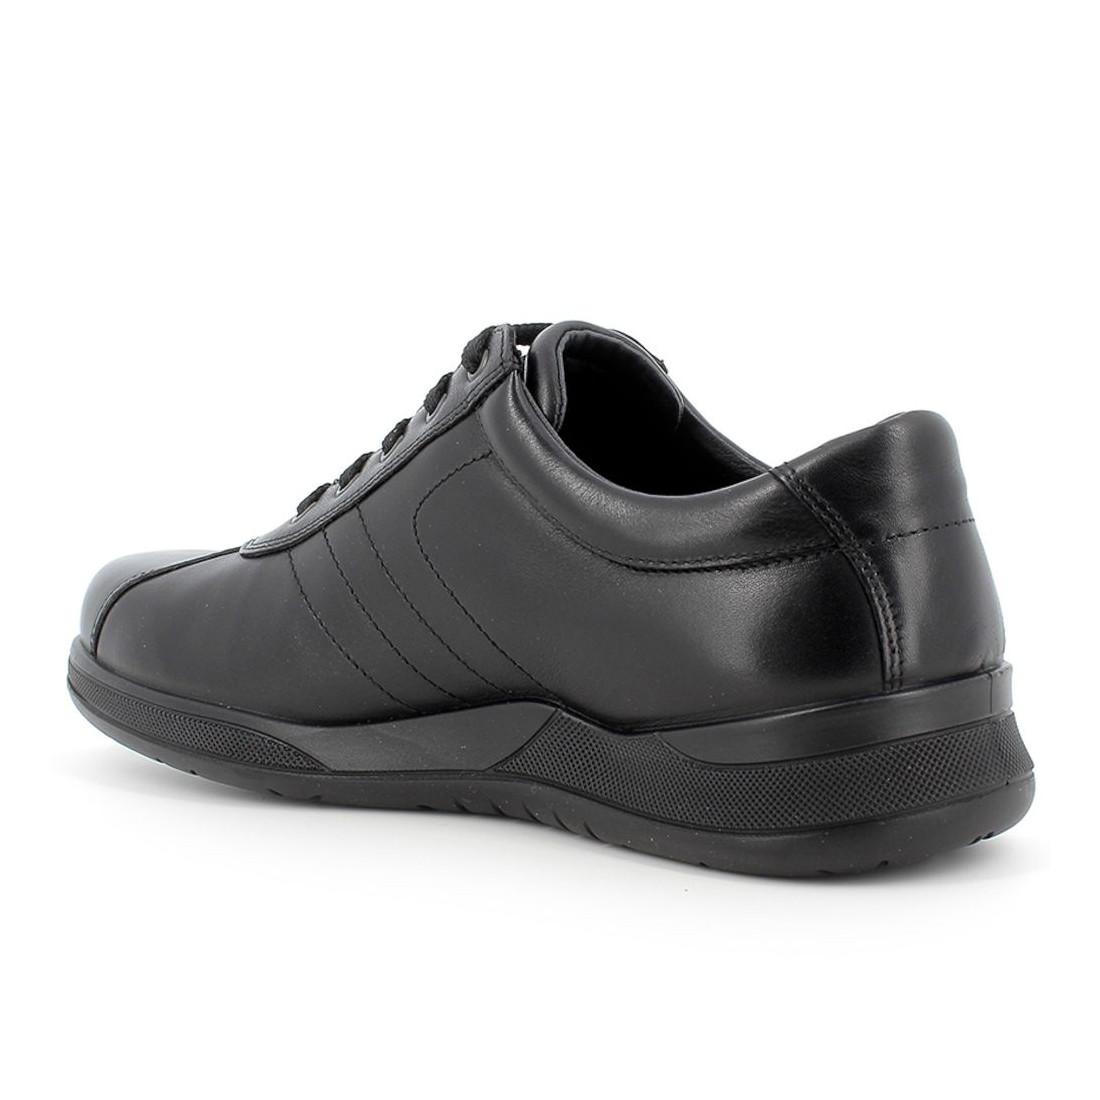 sneakers man igico berny6119200 7948